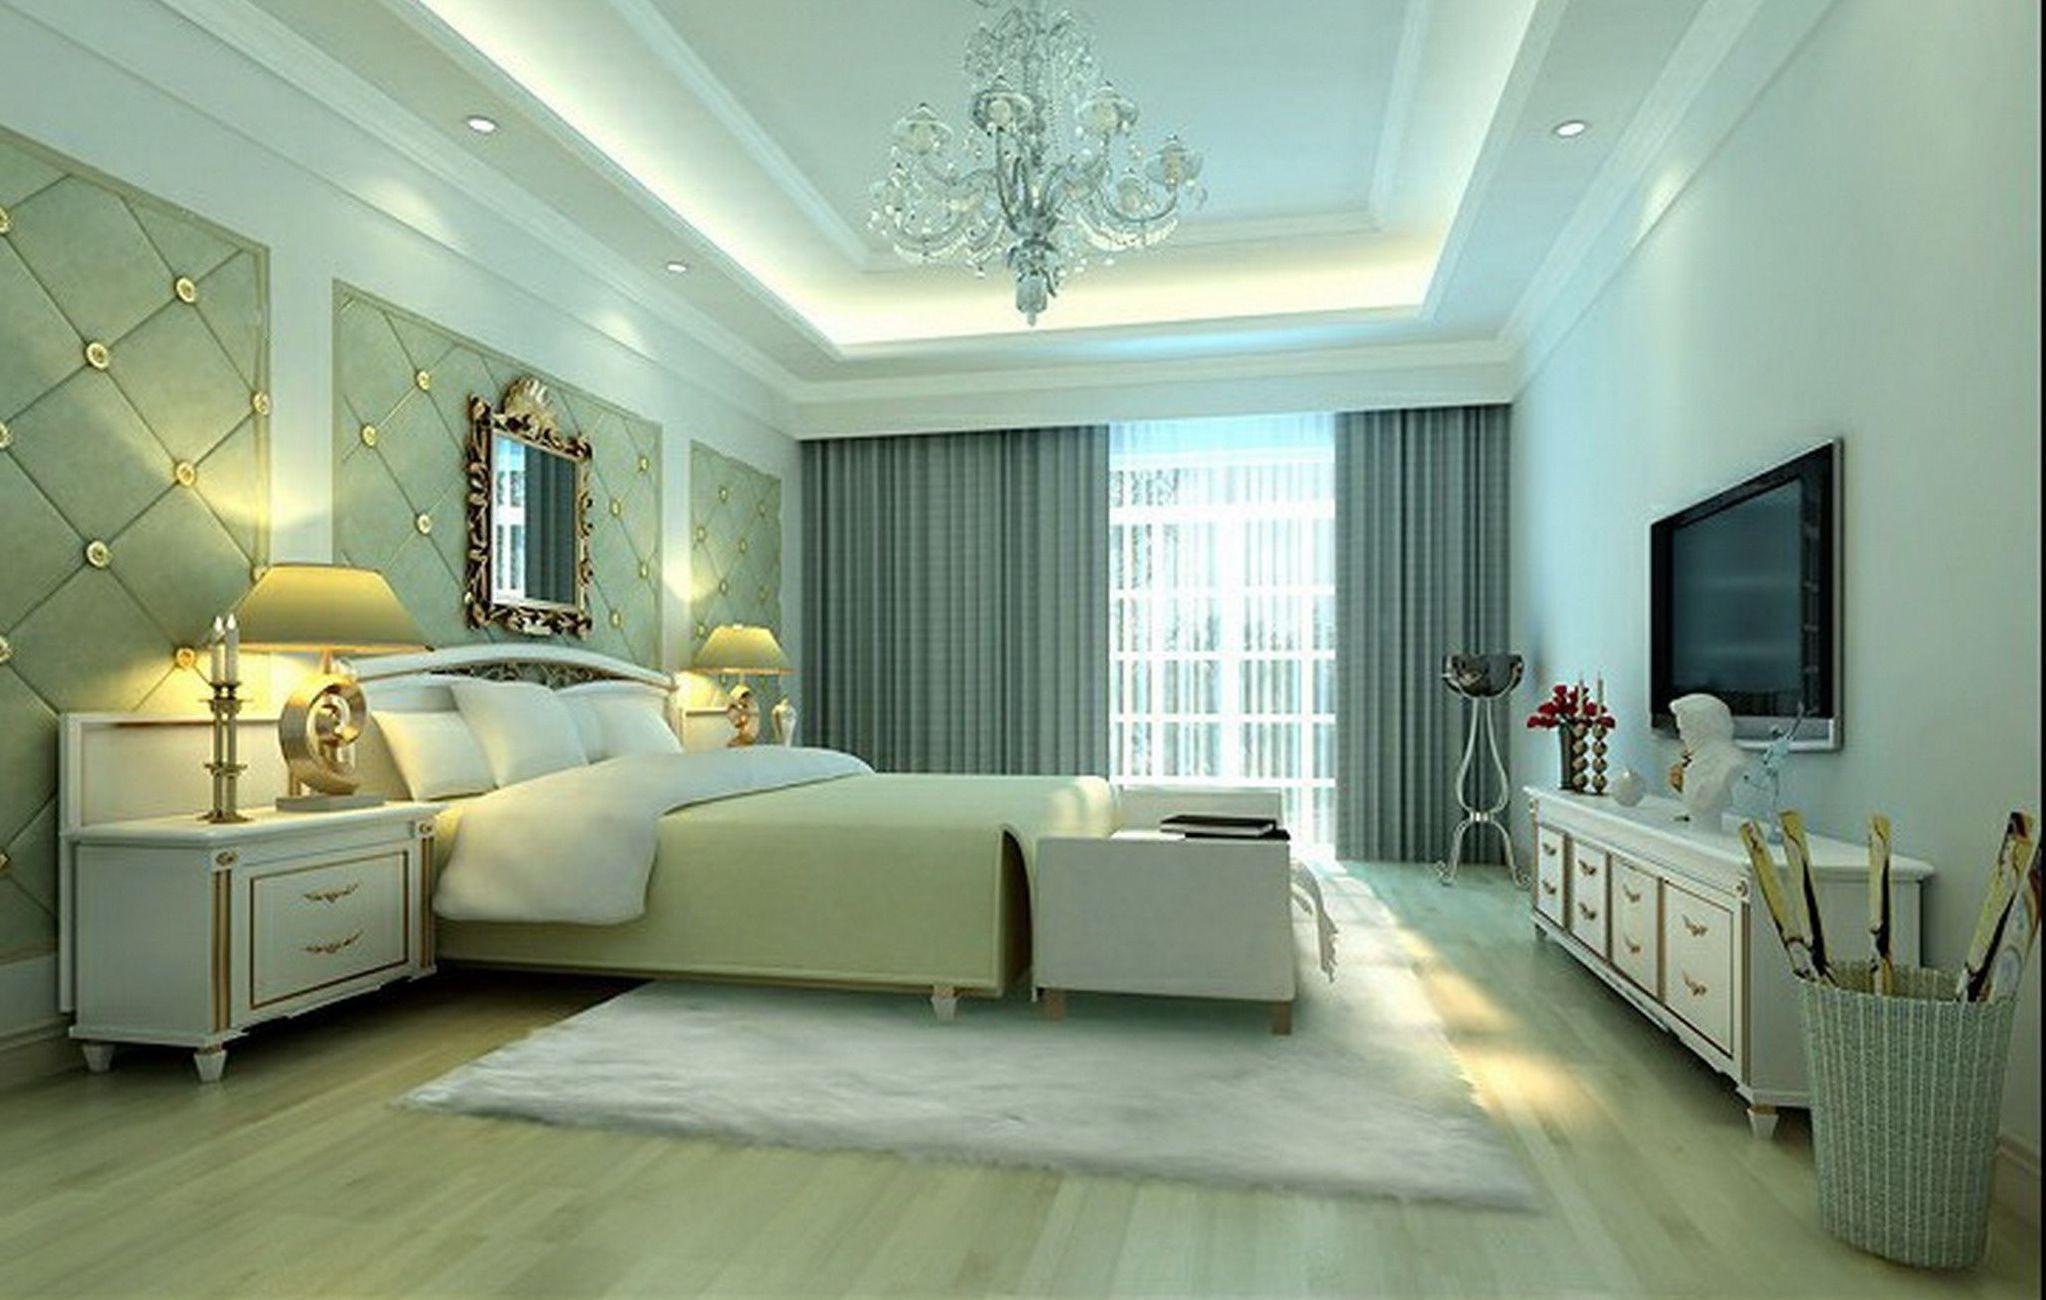 Ceiling Lights Bedroom  Ultimate Guide to Bedroom Ceiling Lights Traba Homes